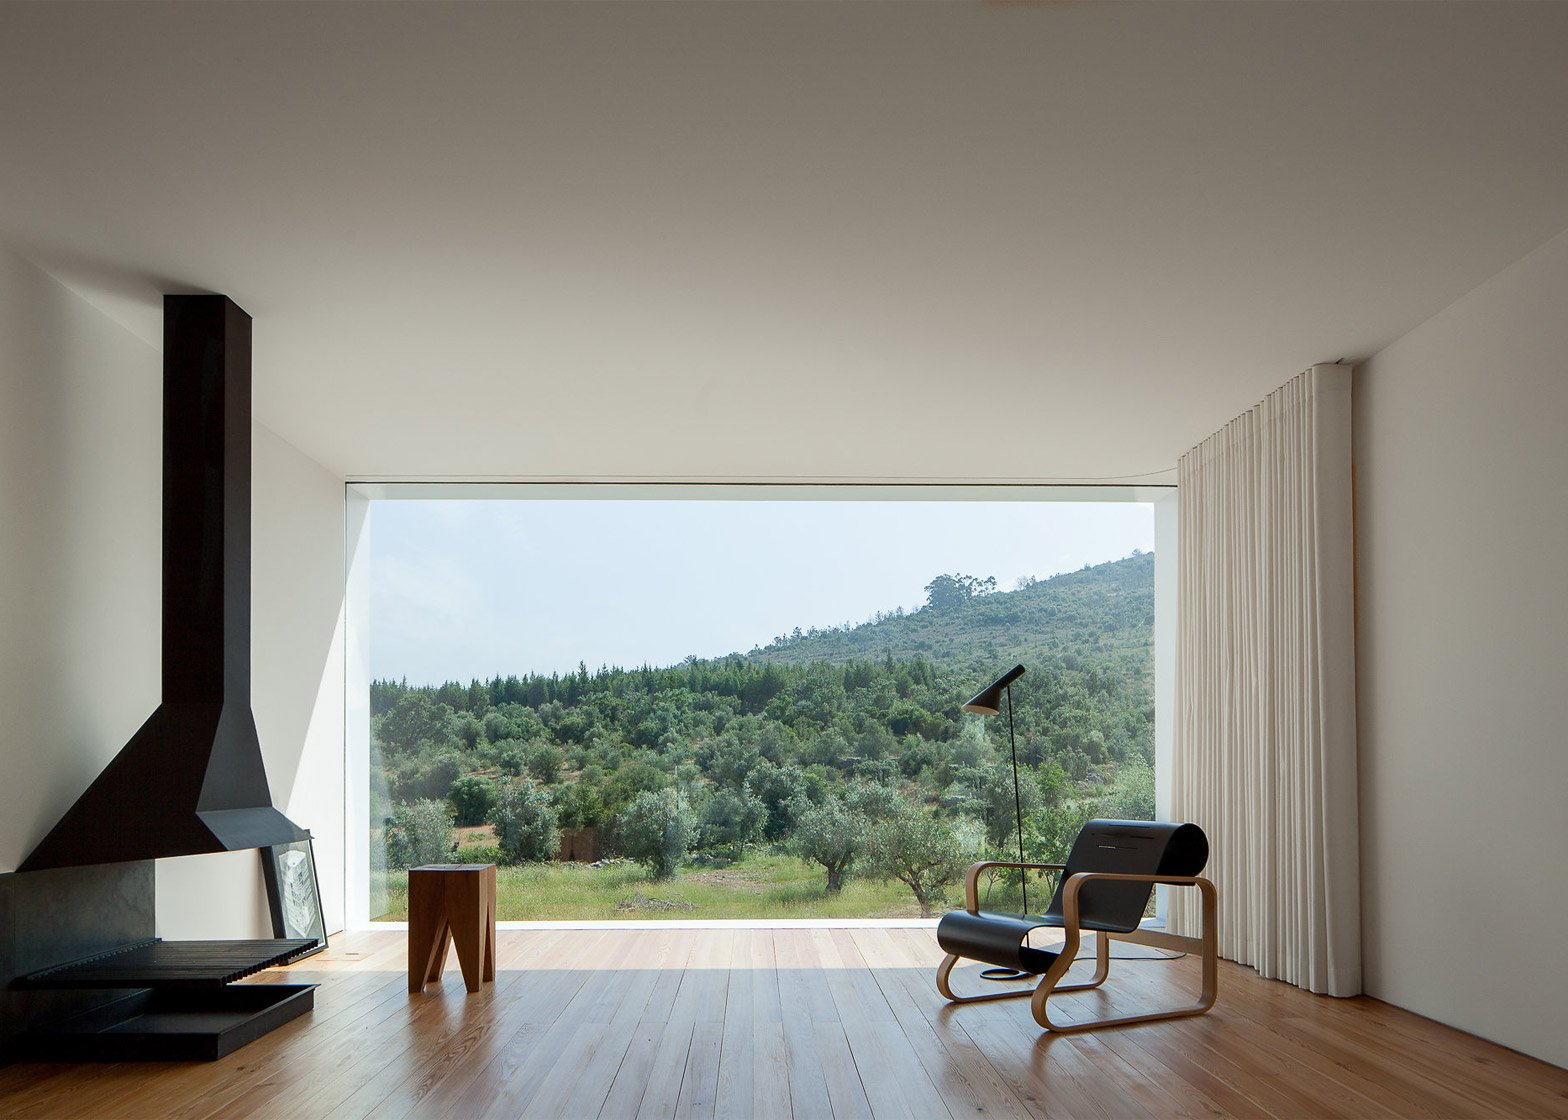 House in Fonte Boa by Joao Mendes Ribeiro